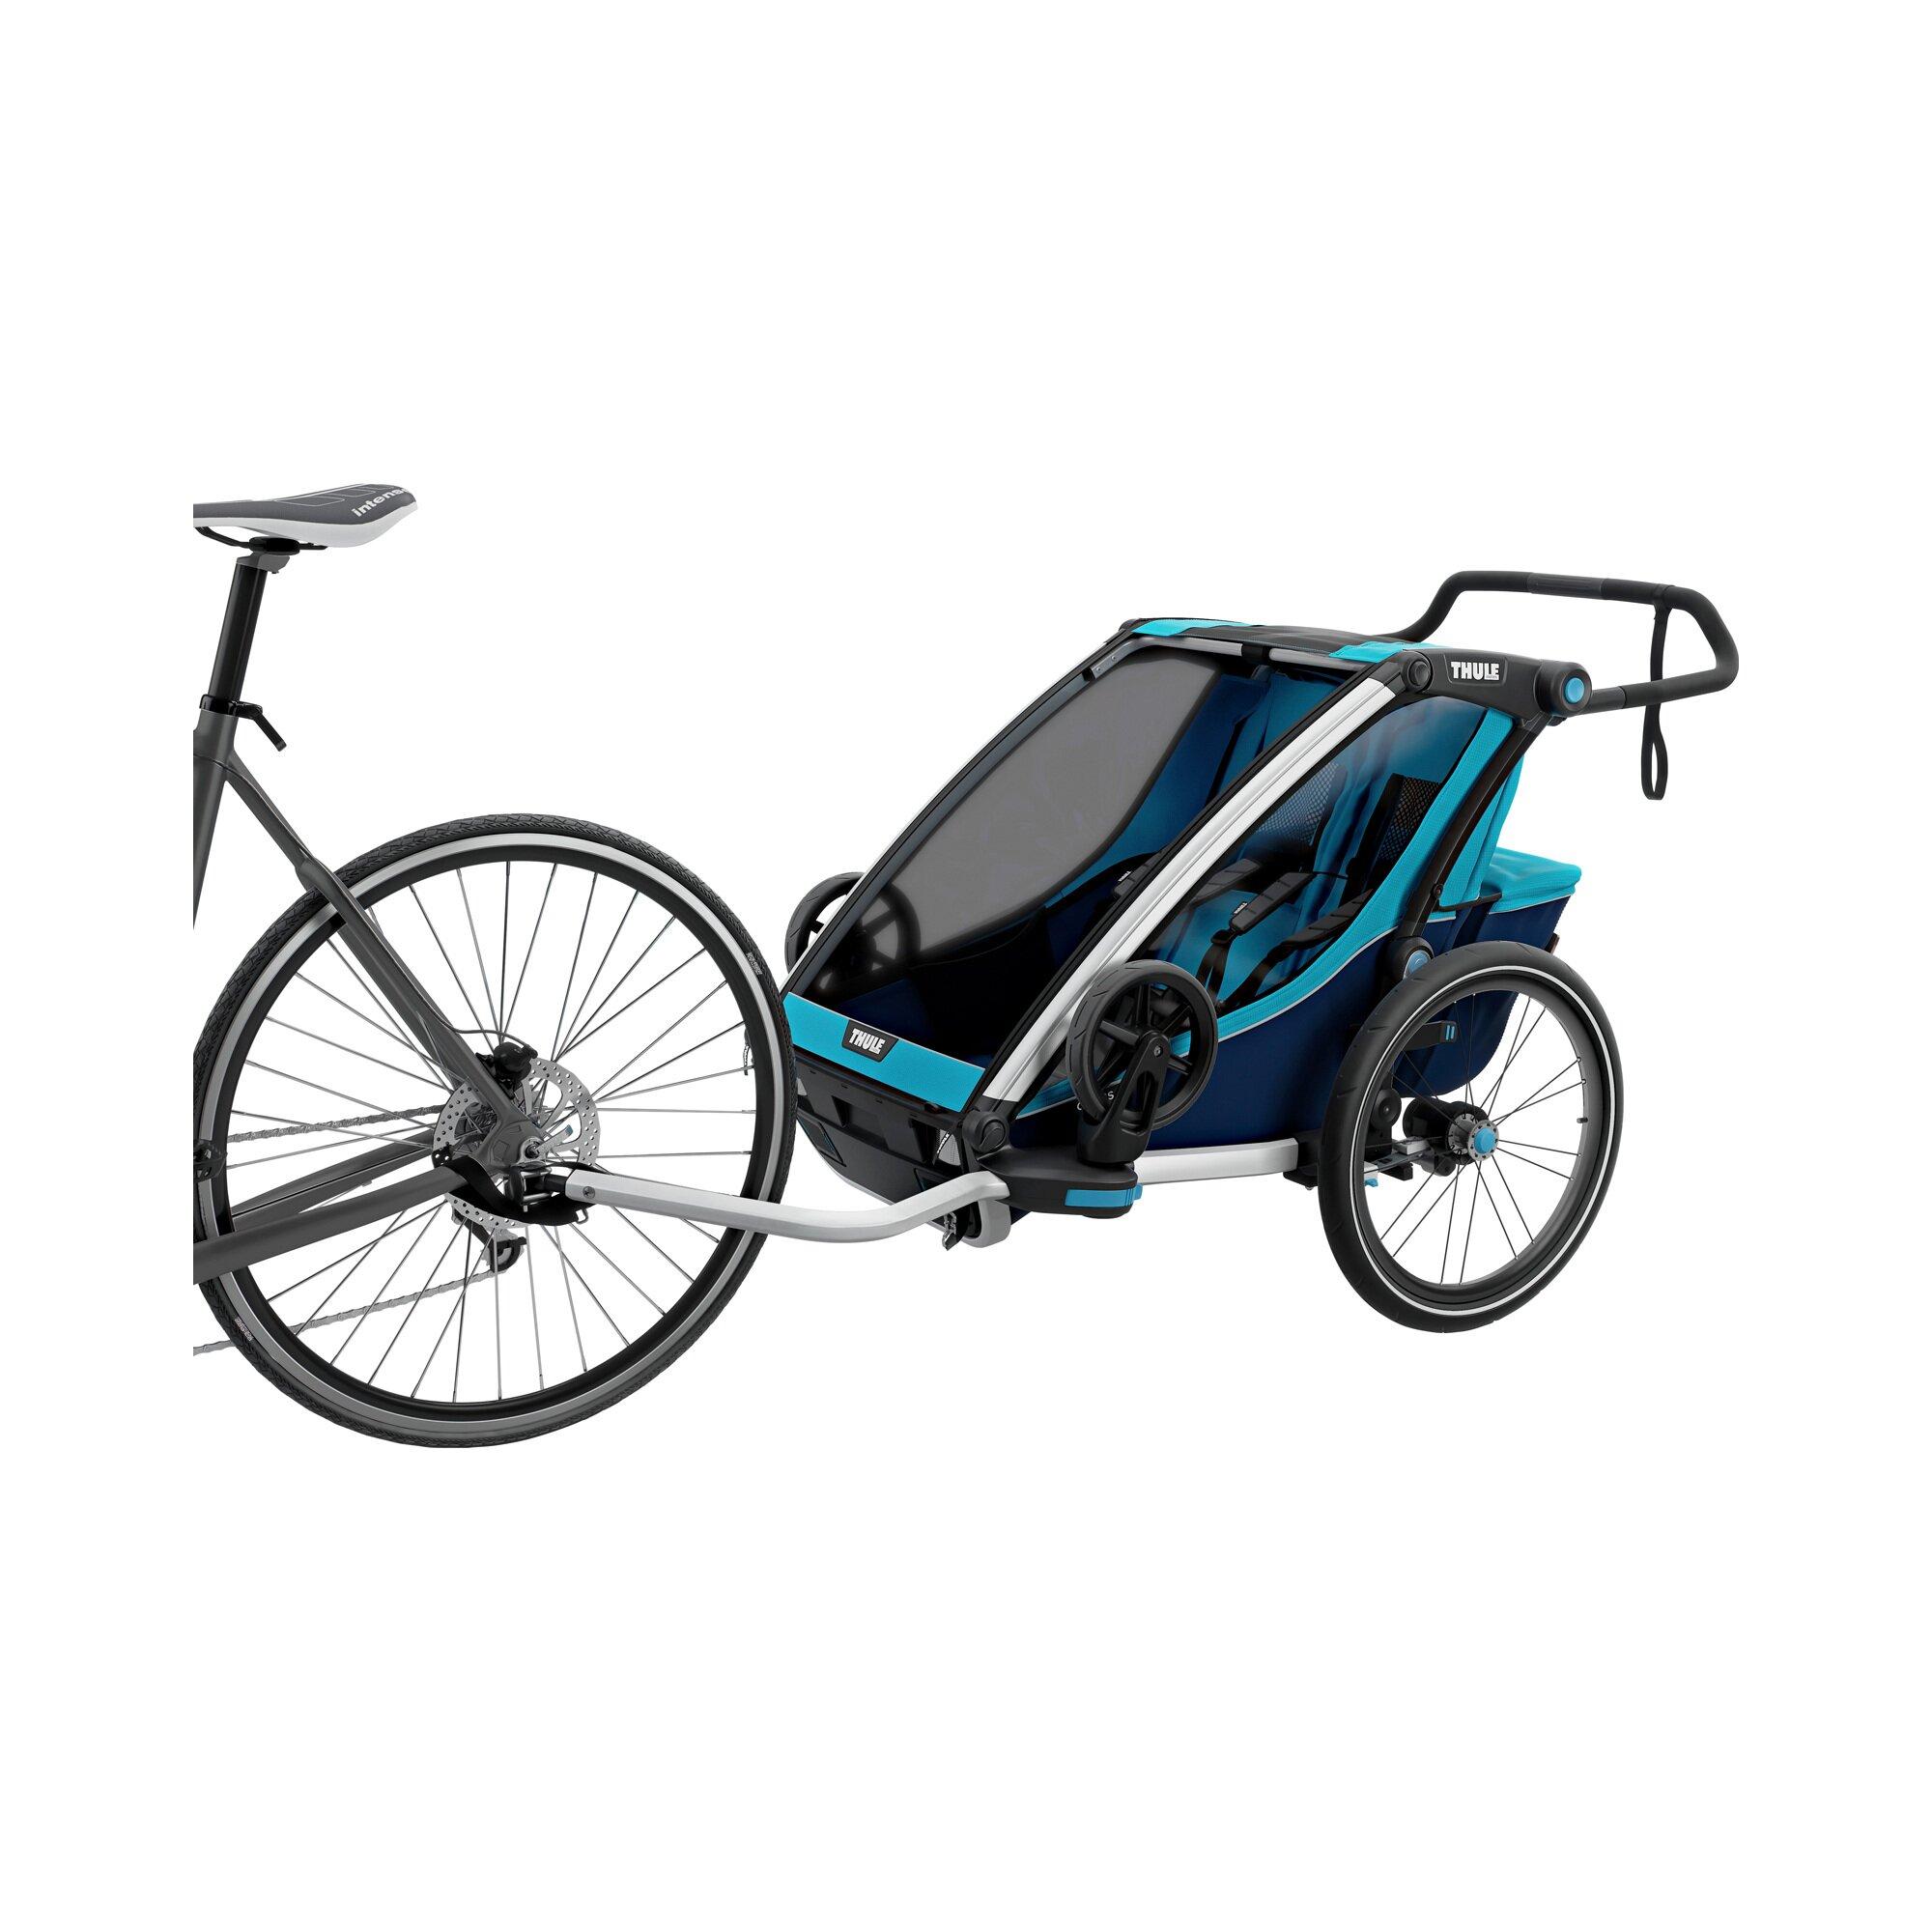 thule-chariot-cross2-fahrradanhanger